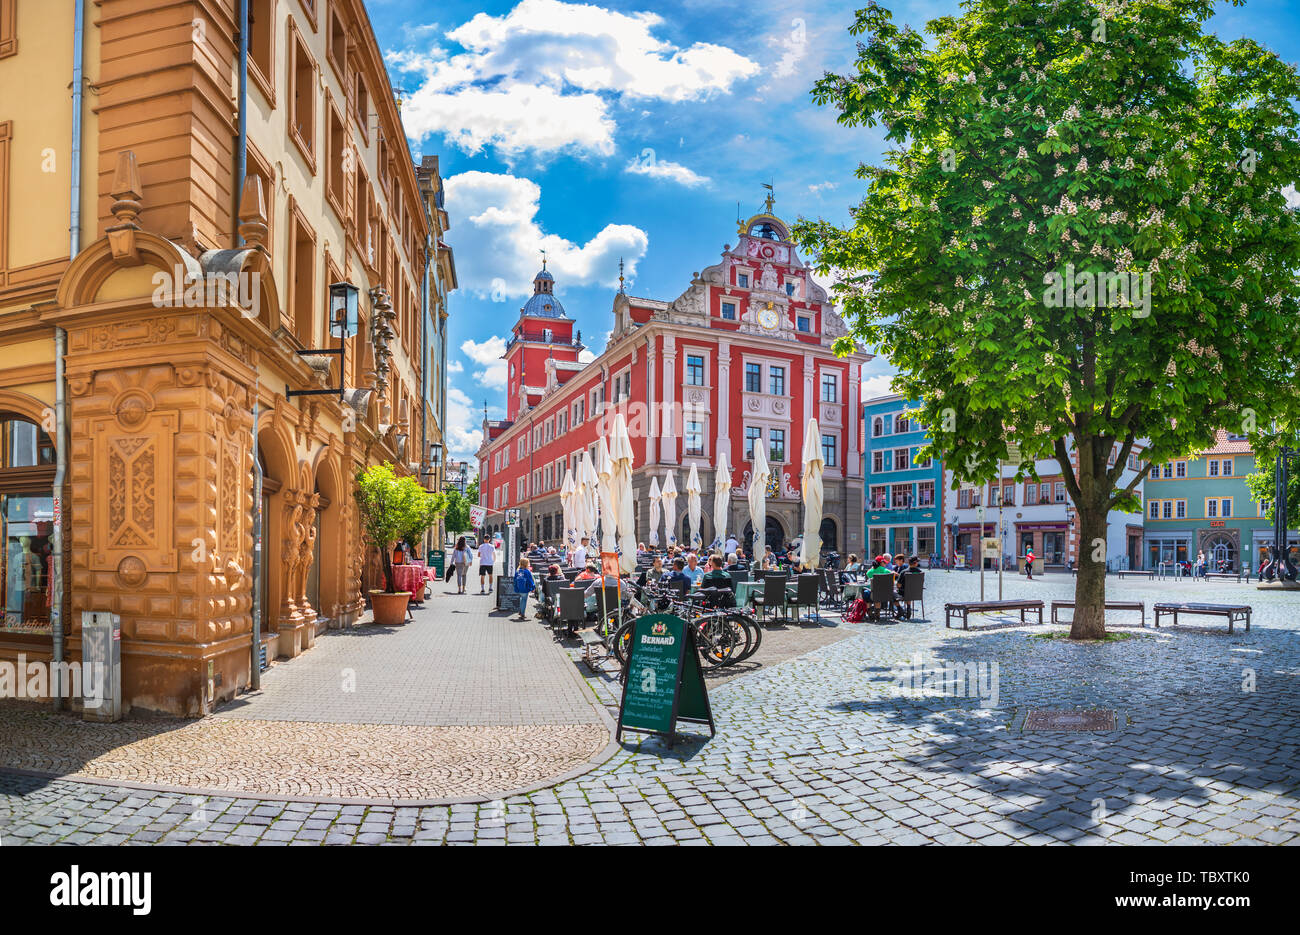 GOTHA, GERMANY - CIRCA MAY, 2019: City administration alias Stadtverwaltung on Hauptmarkt of Gotha, Thuringia, Germany Stock Photo